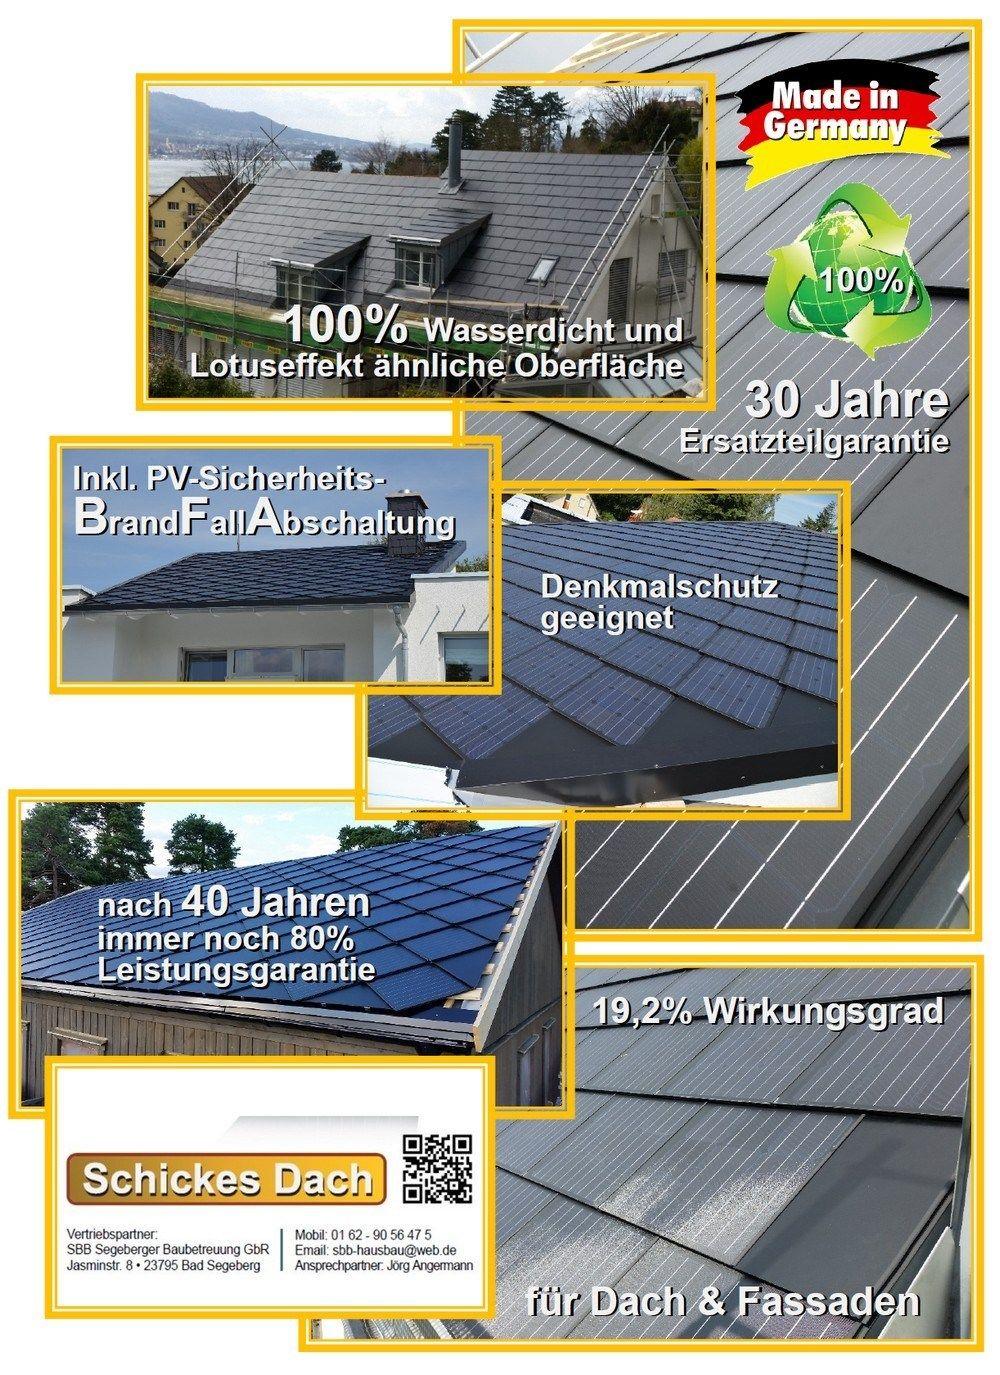 High Quality Solardach U003d Neues Dach + Photovoltaik + Heizung + Isolierung Bei Wärme  Und  Kälte